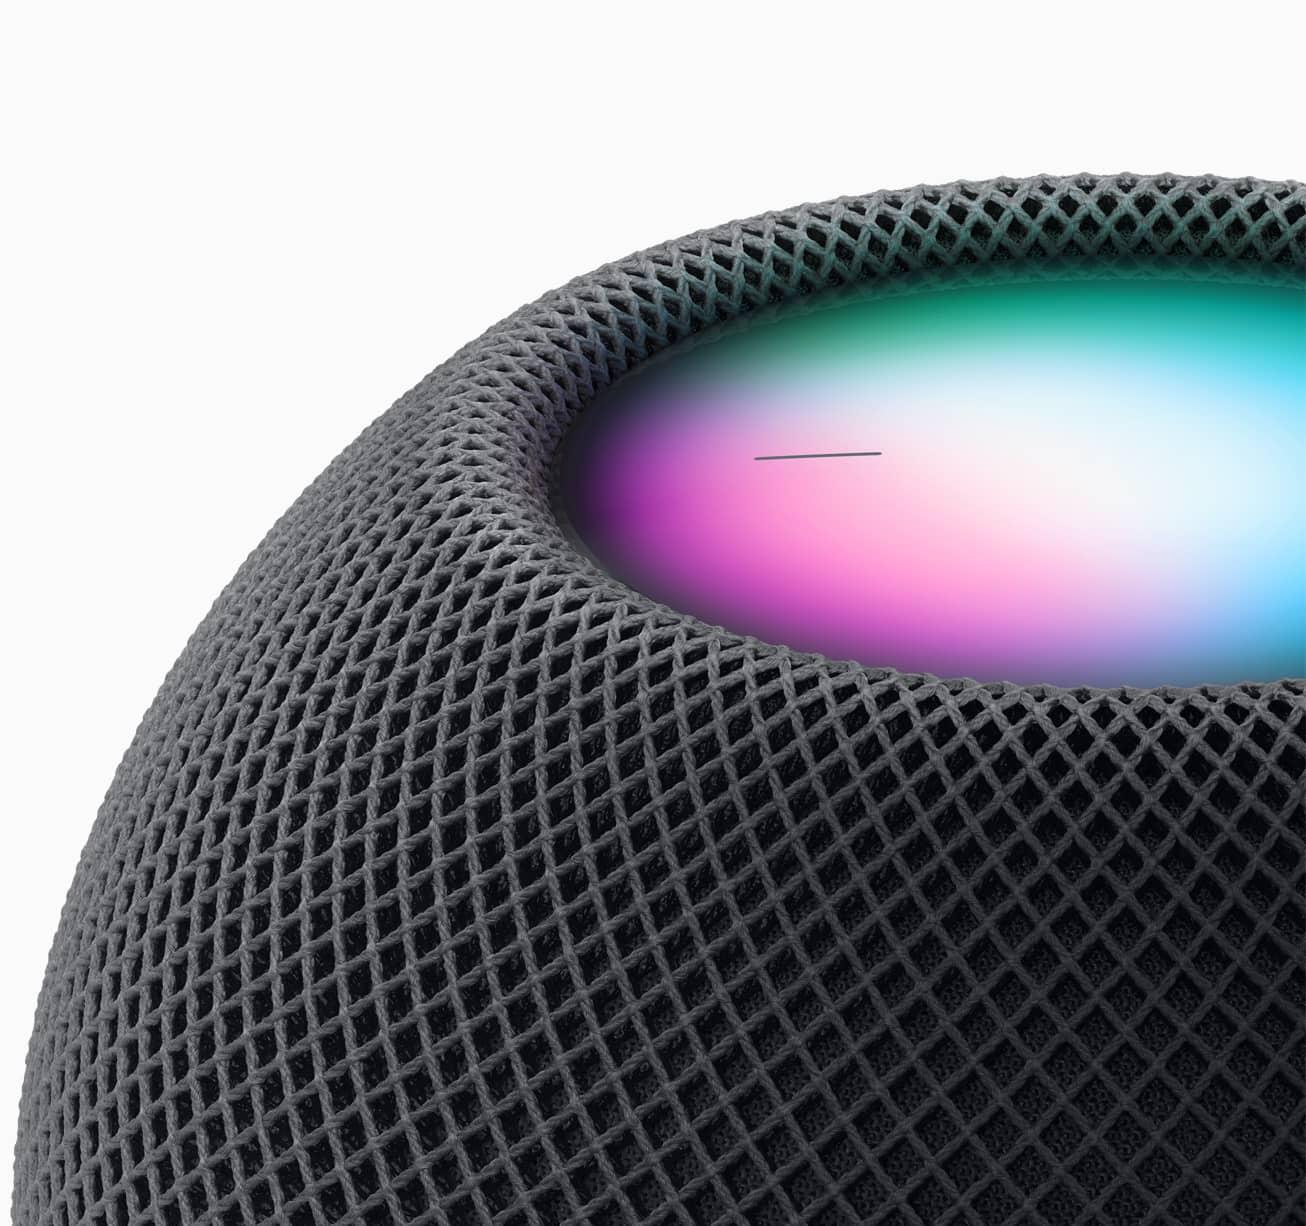 Apple homepod mini space gray close up 10132020